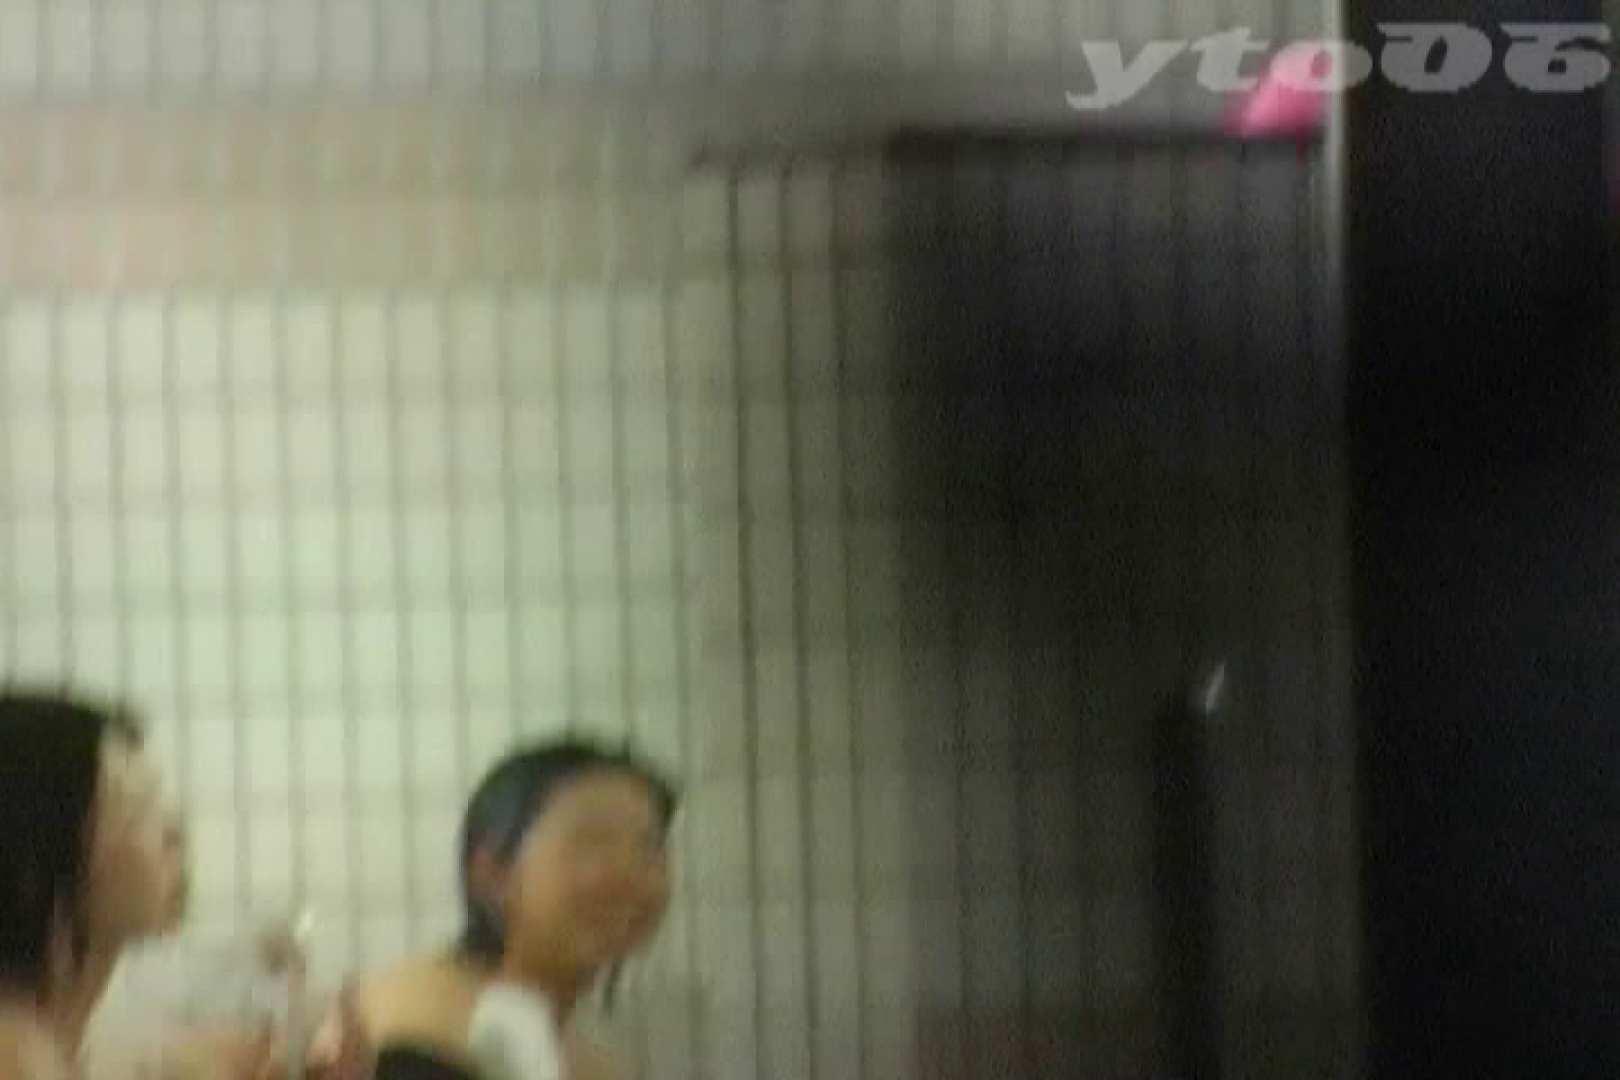 ▲復活限定▲合宿ホテル女風呂盗撮 Vol.34 盗撮・必見 オマンコ無修正動画無料 94画像 43